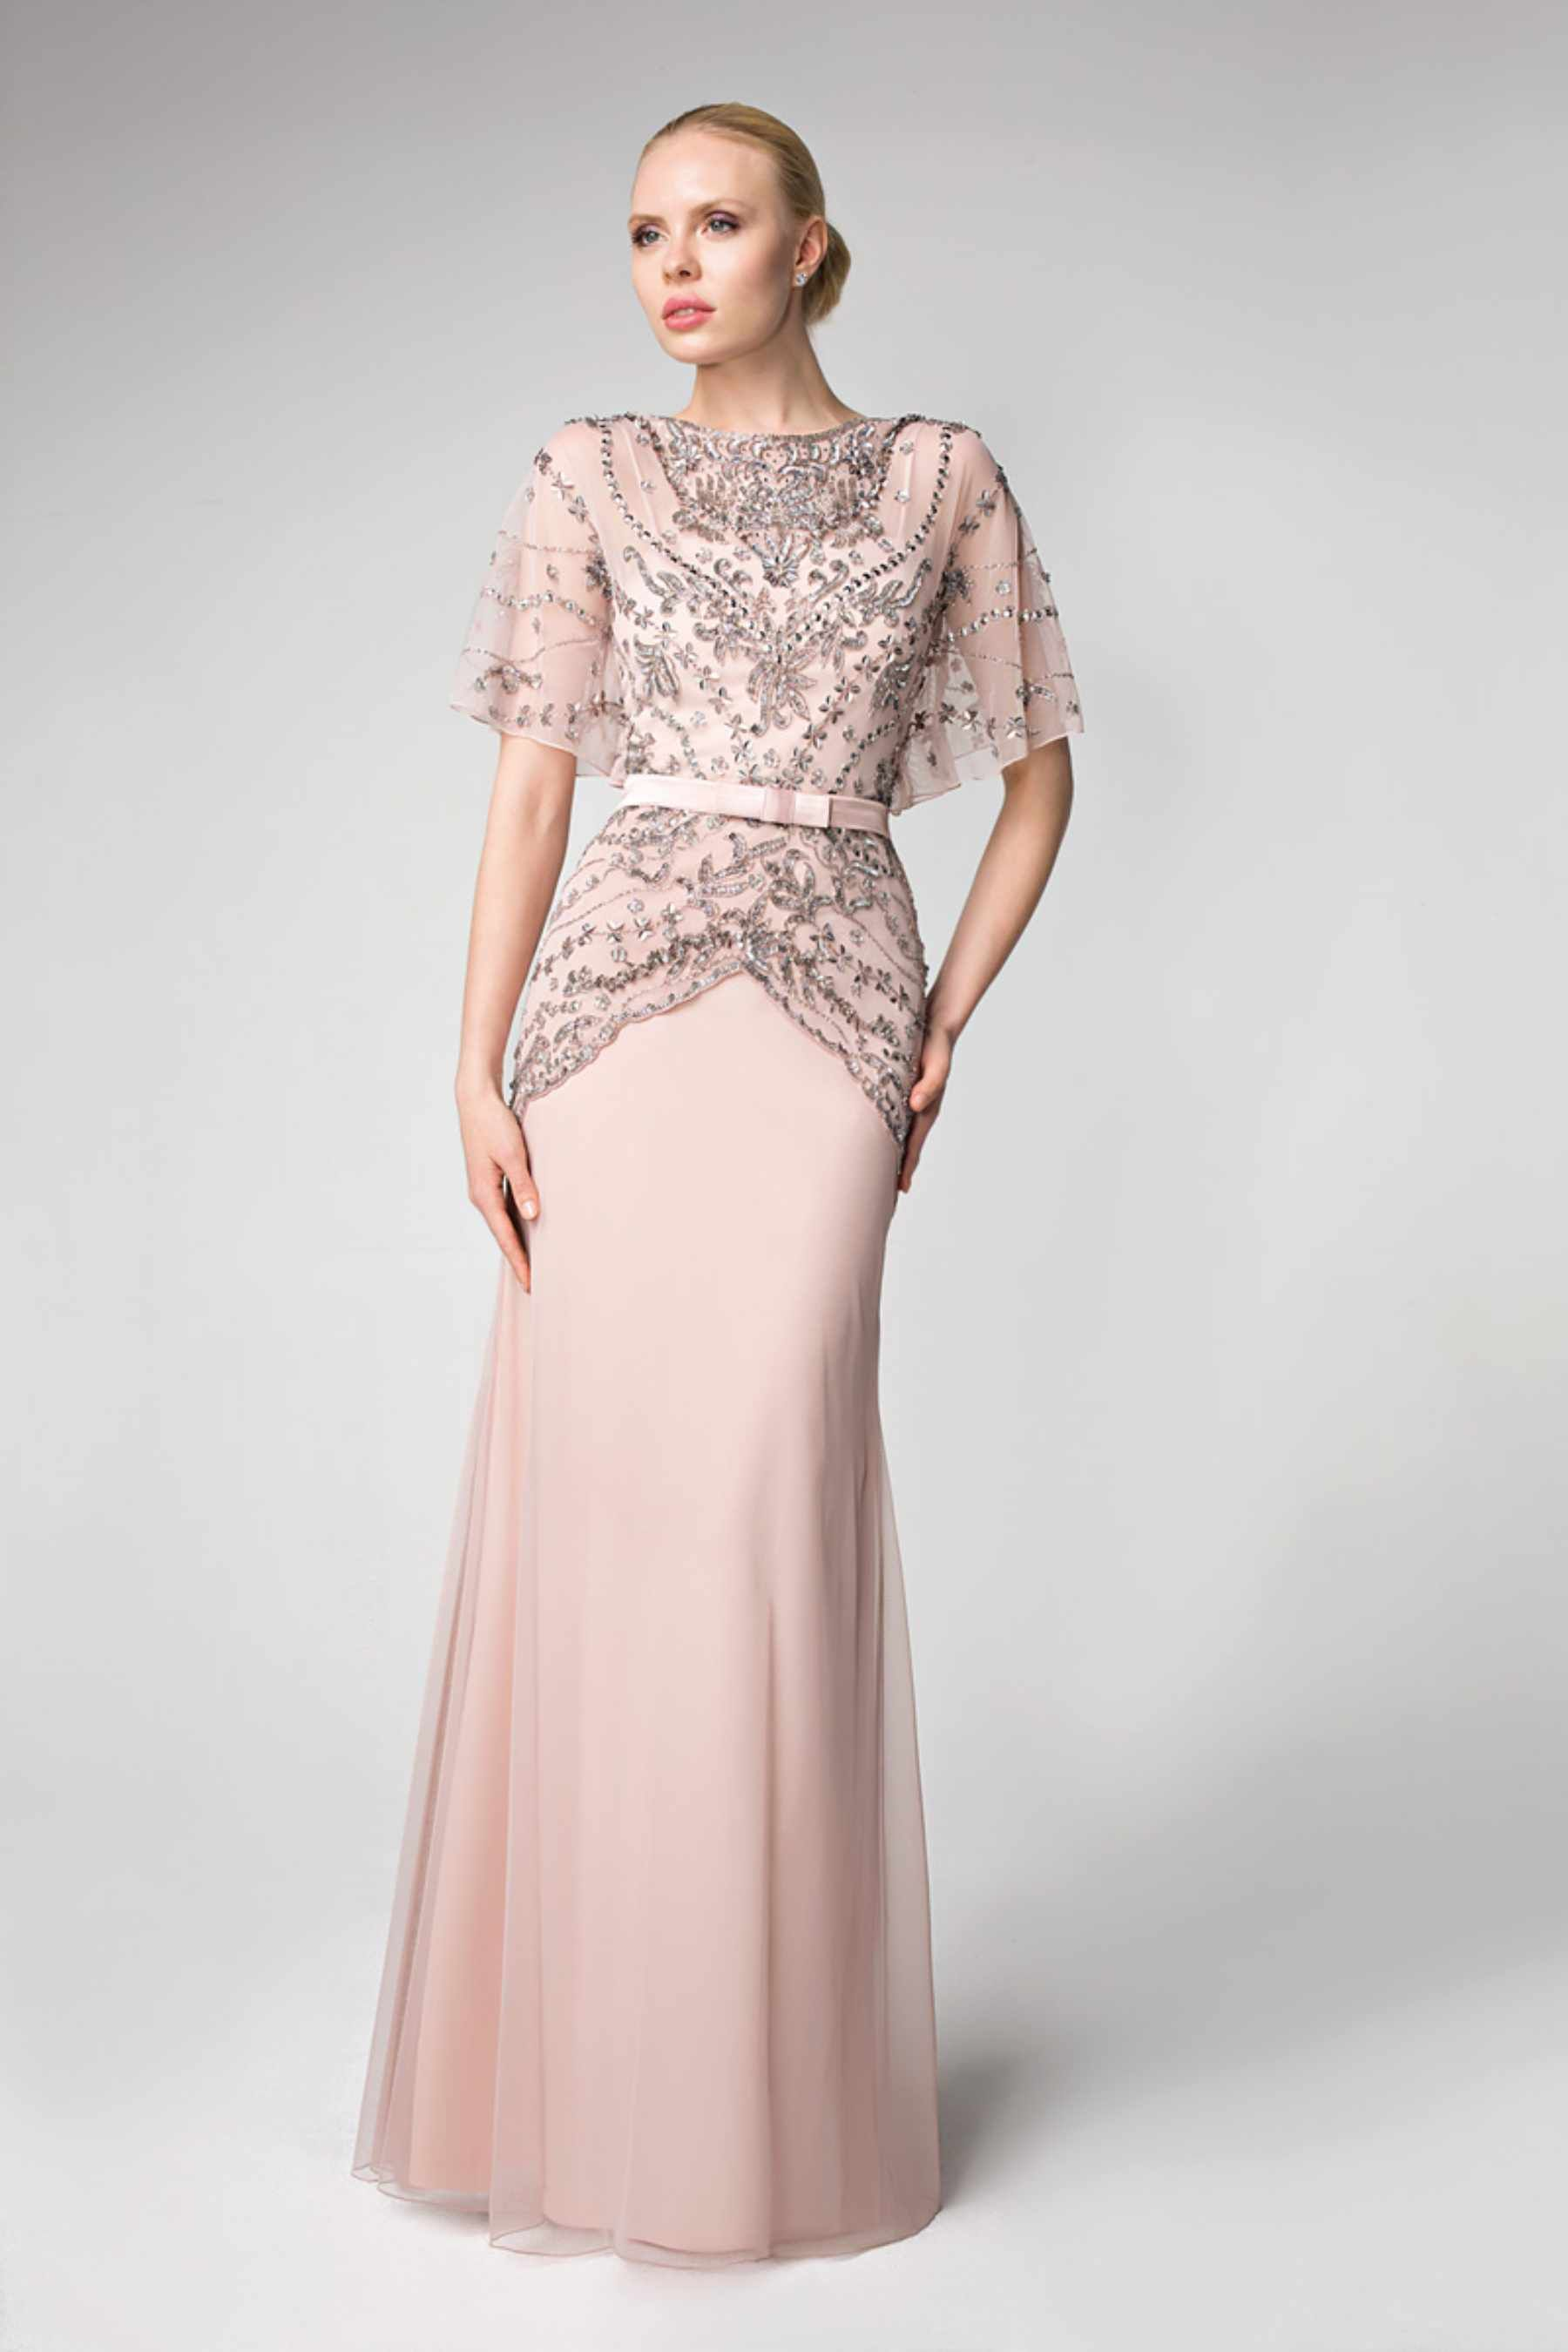 69bad6c47a Demetrios Evening Dress Style D169